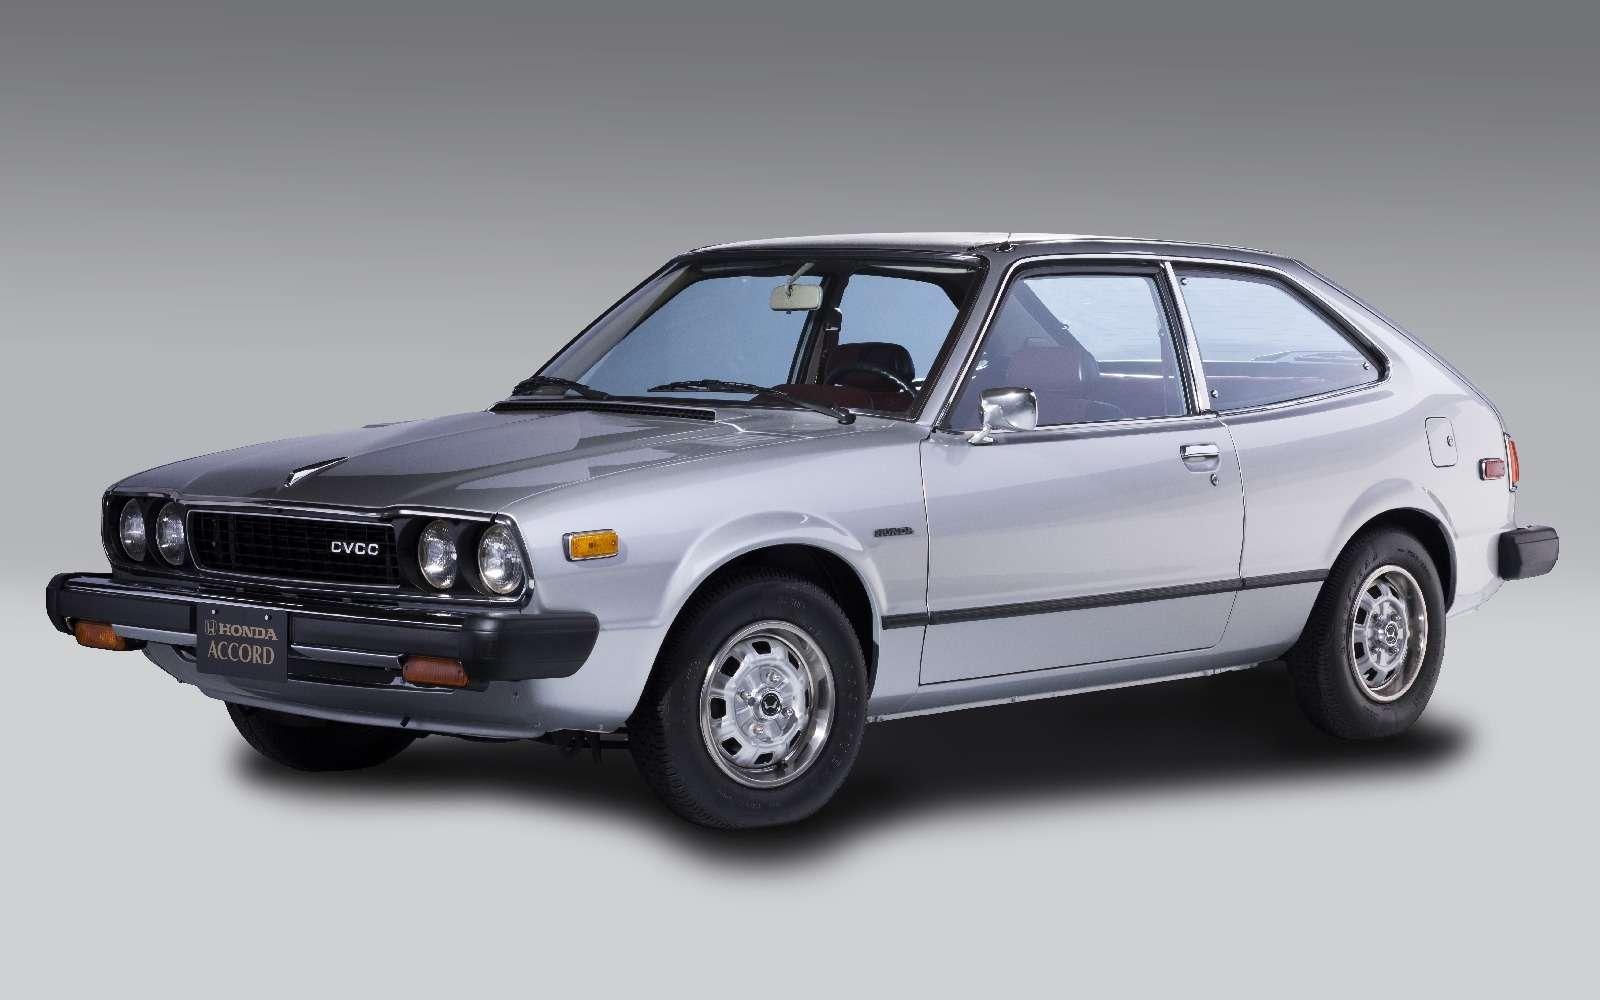 Honda Accord празднует 40-летний юбилей— фото 603973